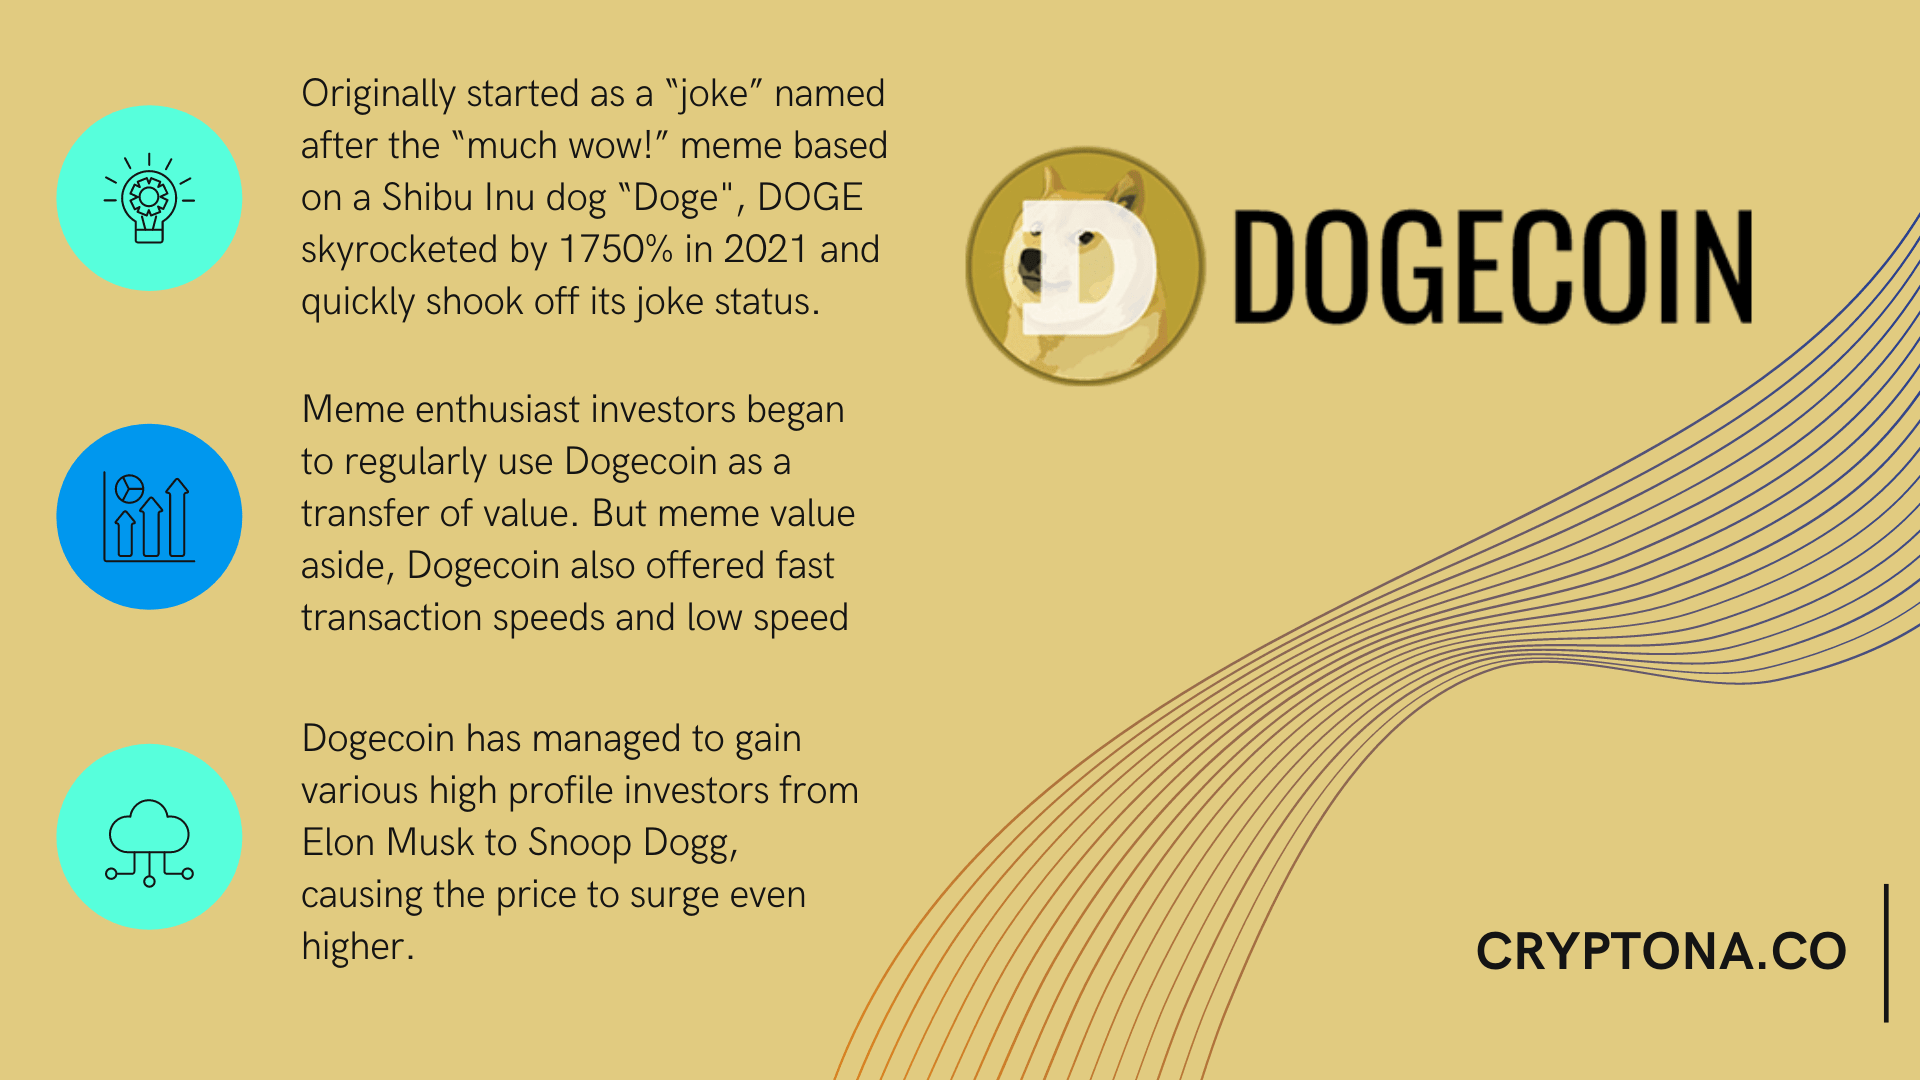 Dogecoin Price Prediction Forecast 2021-2025